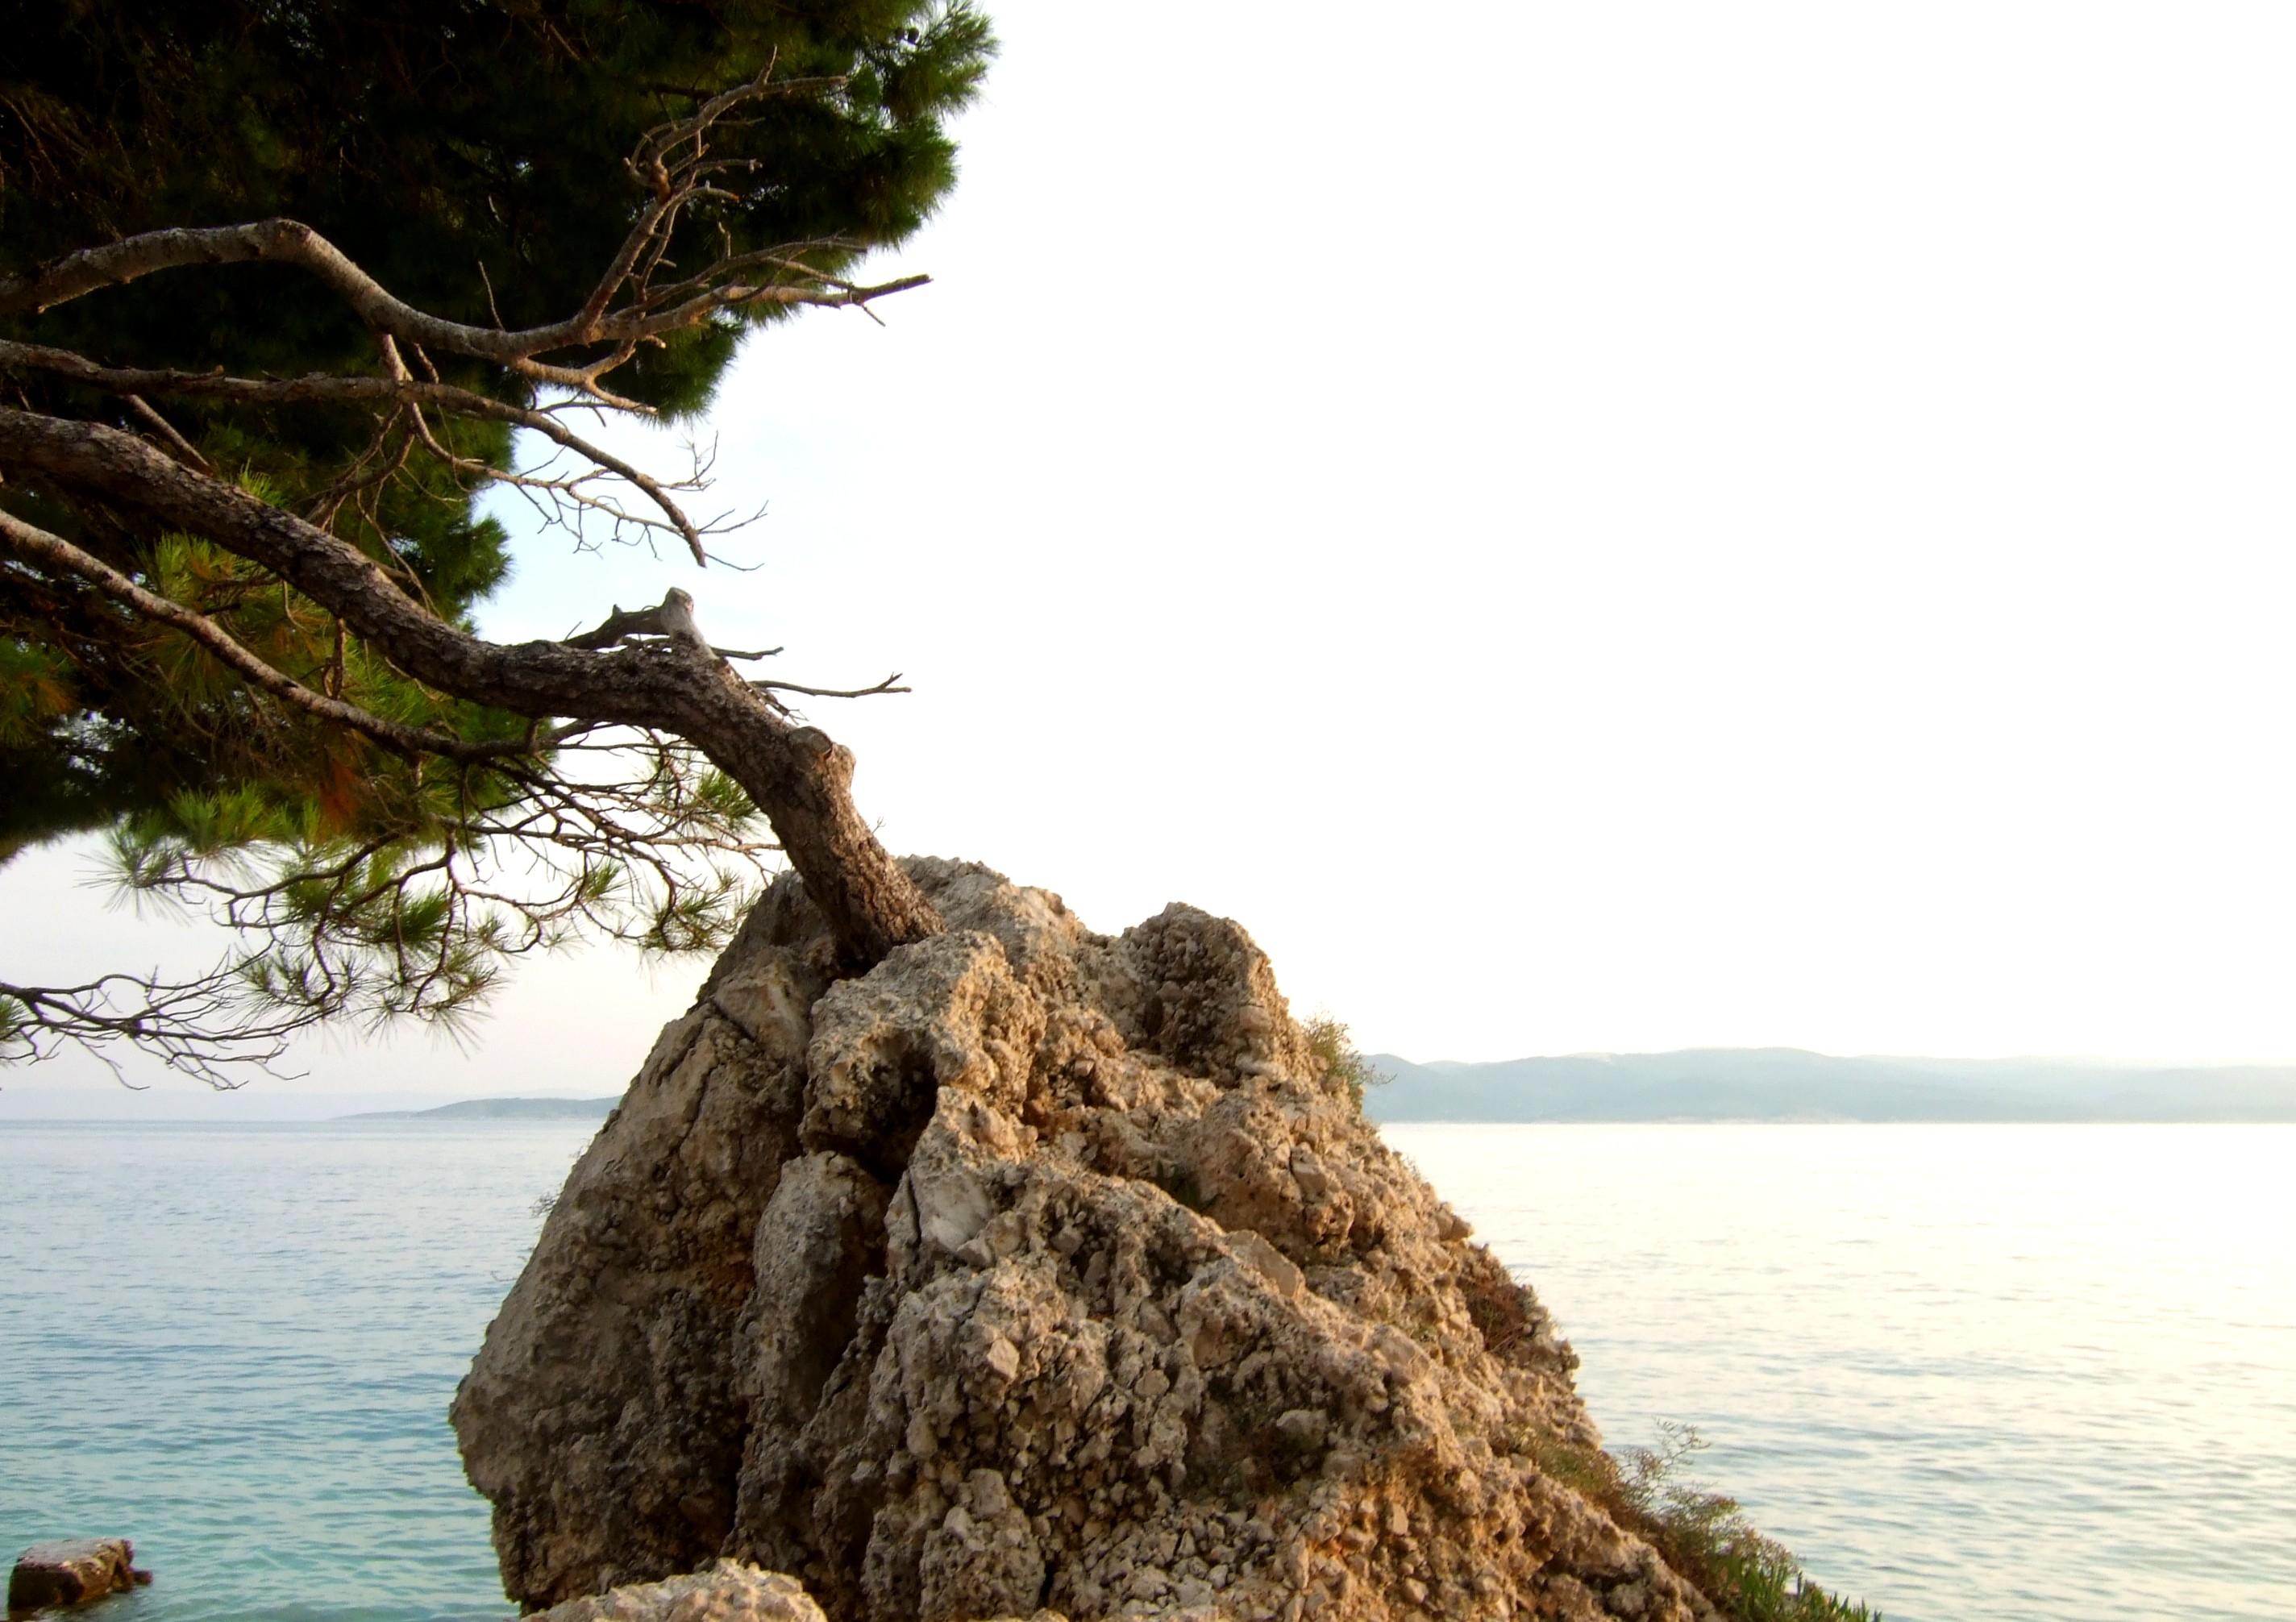 File:Tree on the rock.jpeg - Wikimedia Commons